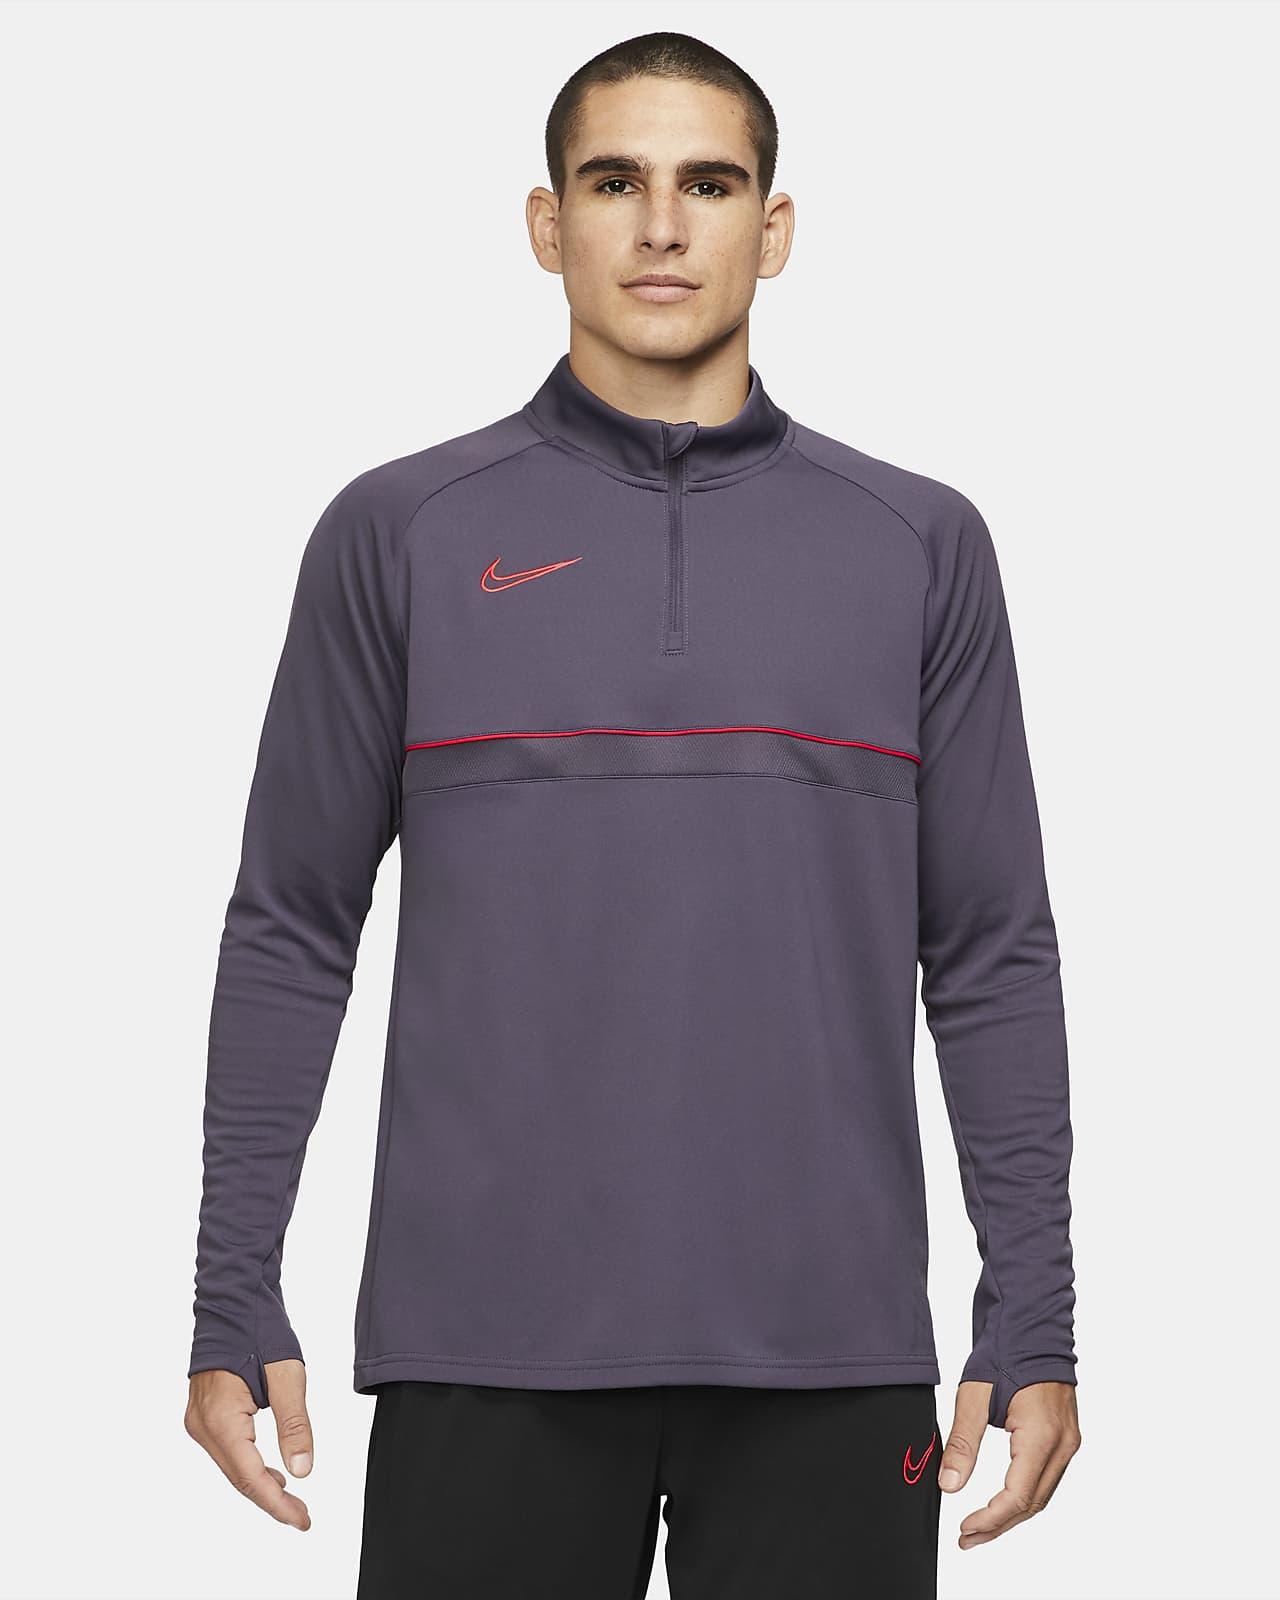 Nike Dri-FIT Academy Men's Football Drill Top